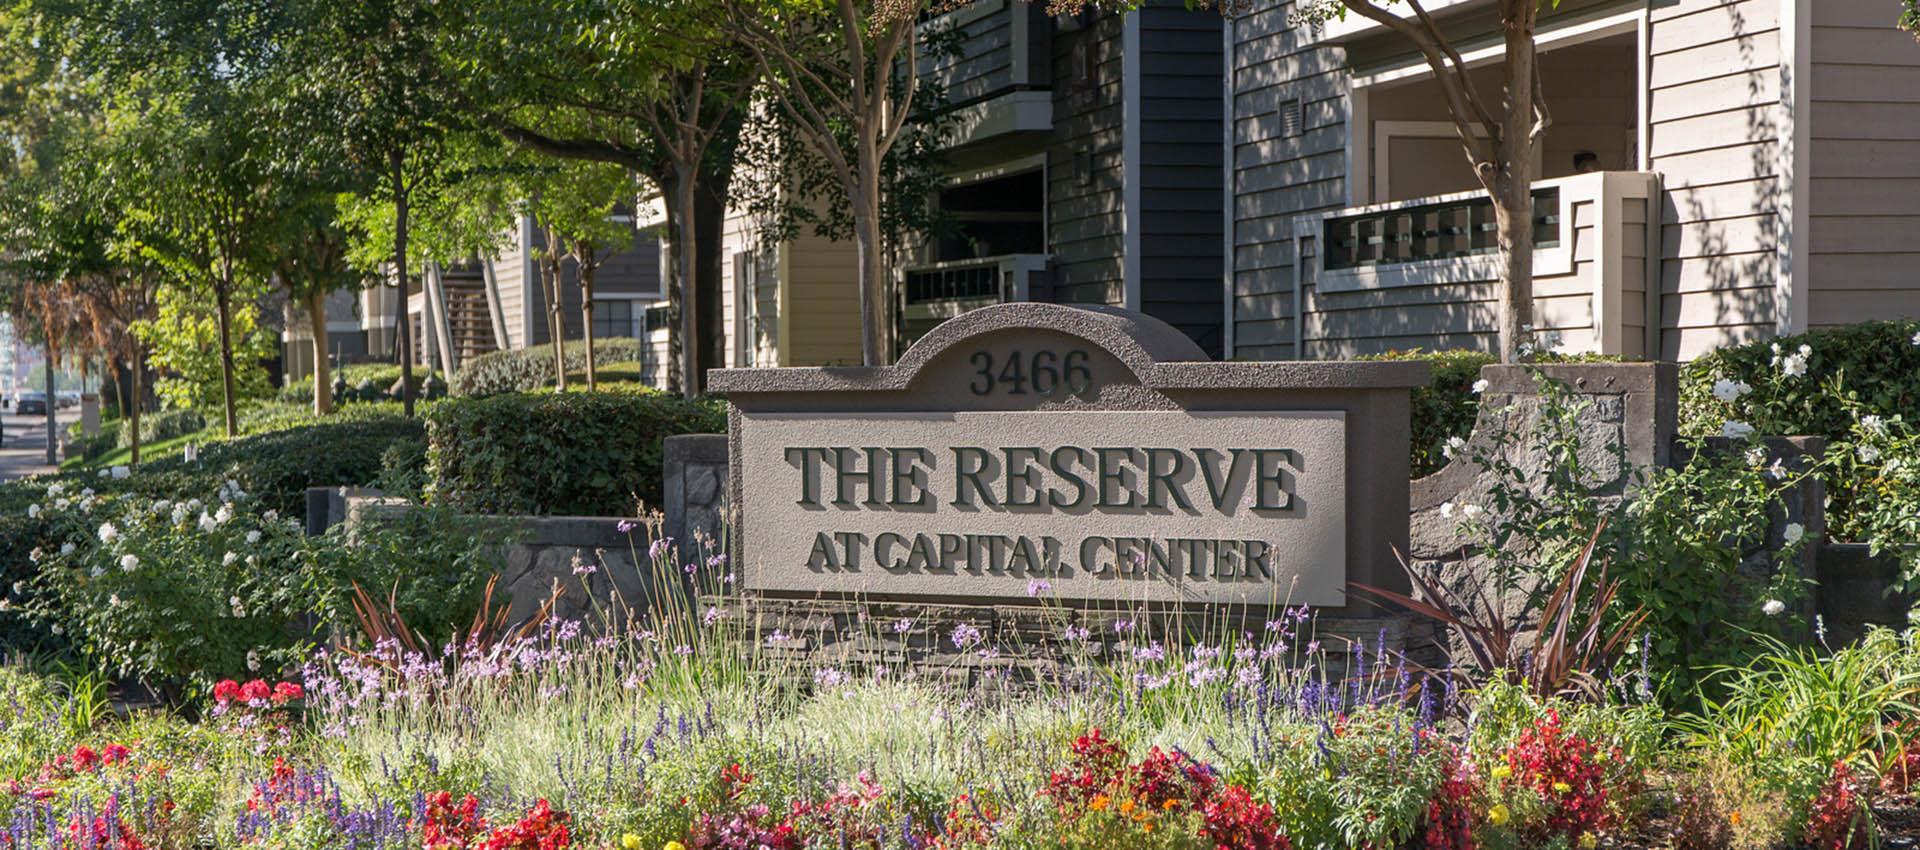 Signage at Reserve at Capital Center Apartment Homes in Rancho Cordova, CA